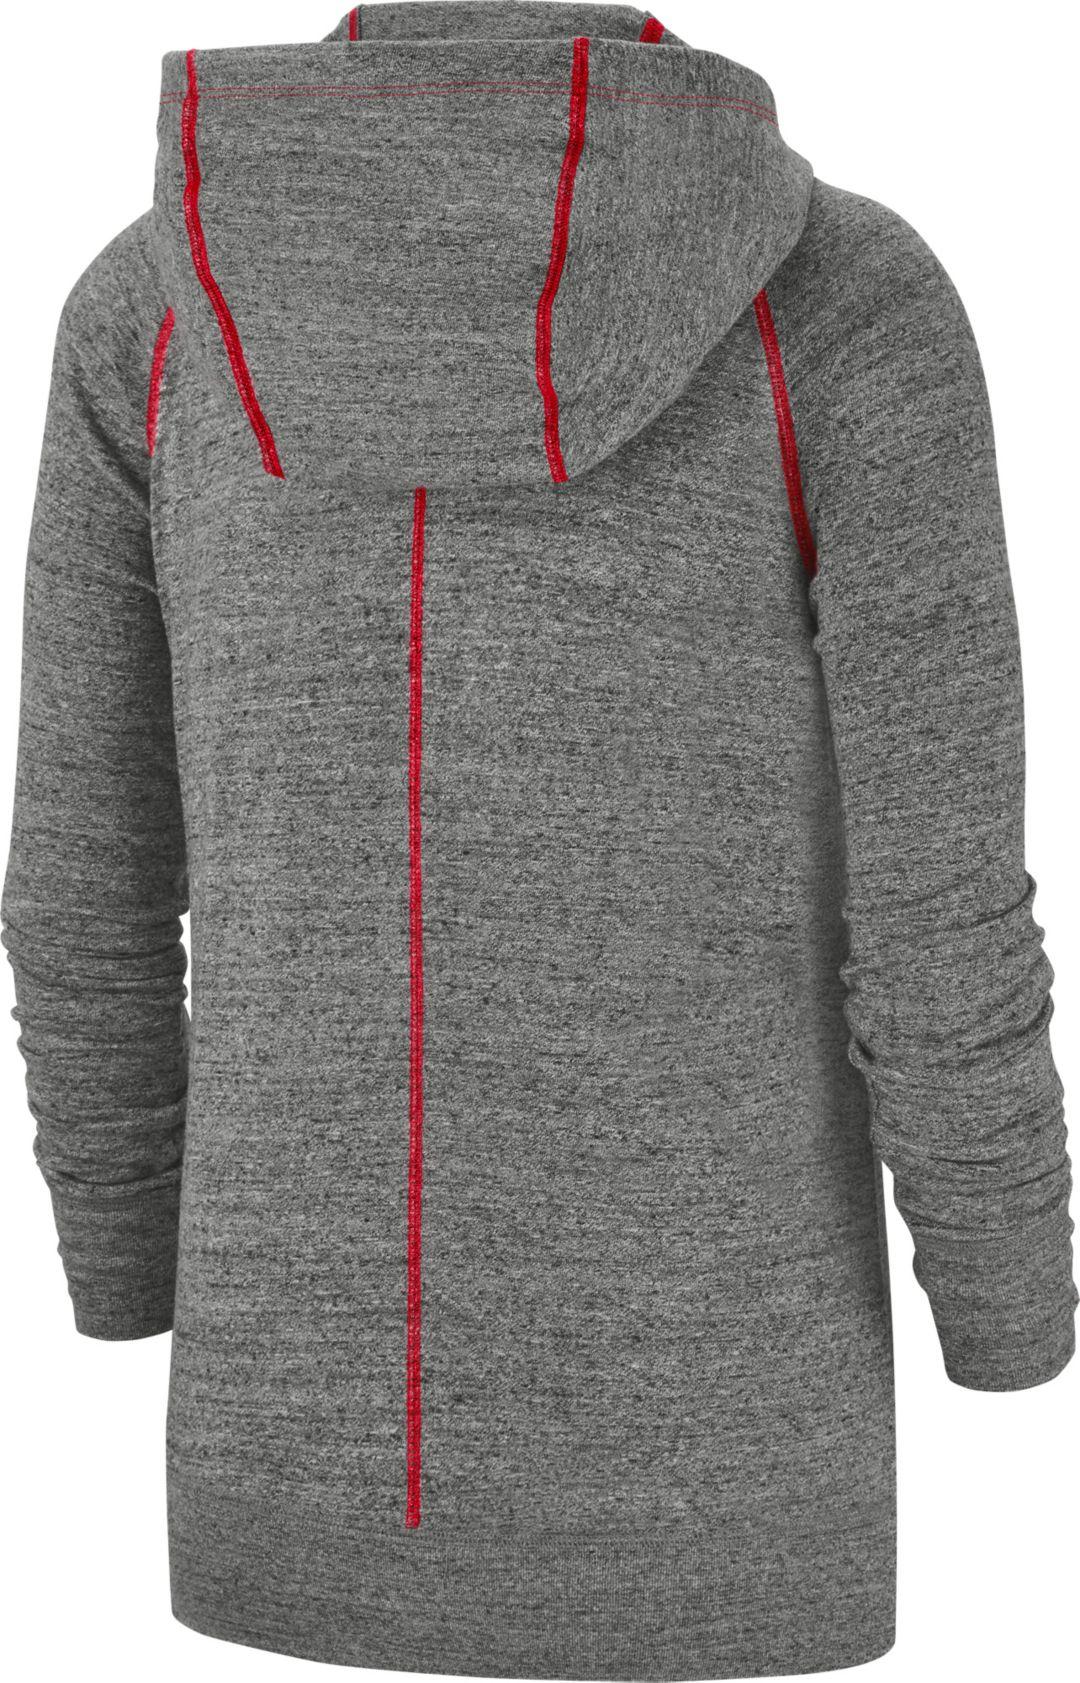 premium selection 646b9 84705 Nike Women's Buffalo Bills Vintage Grey Full-Zip Hoodie